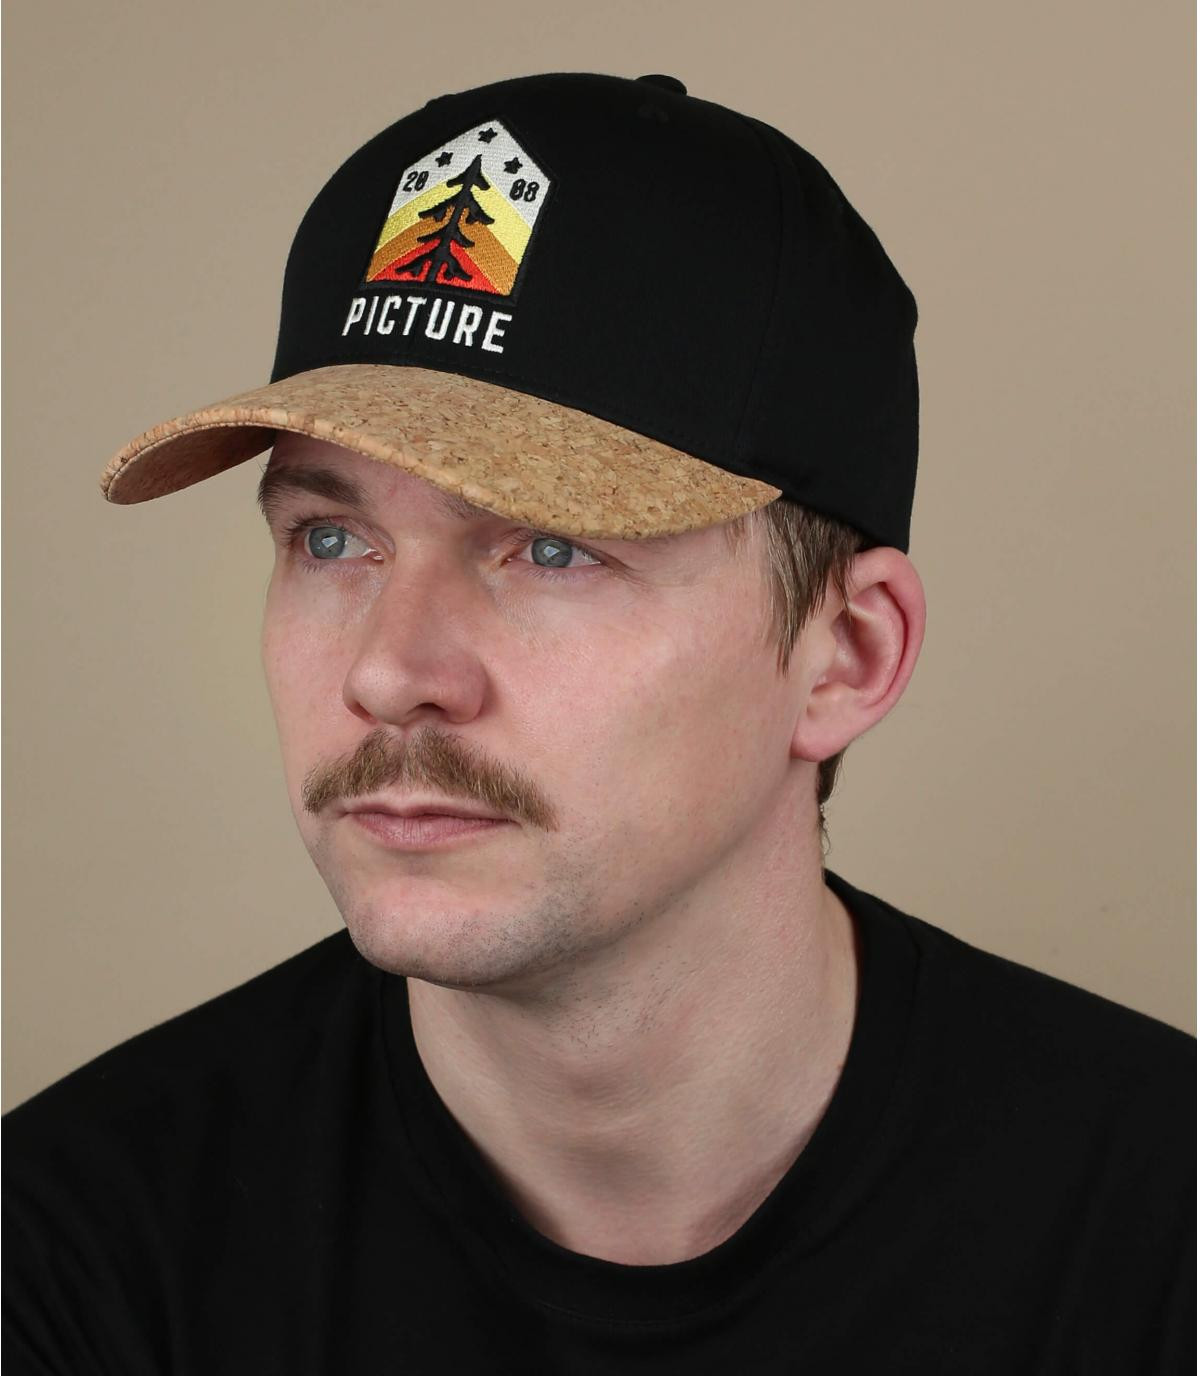 gorra Picture negro pino